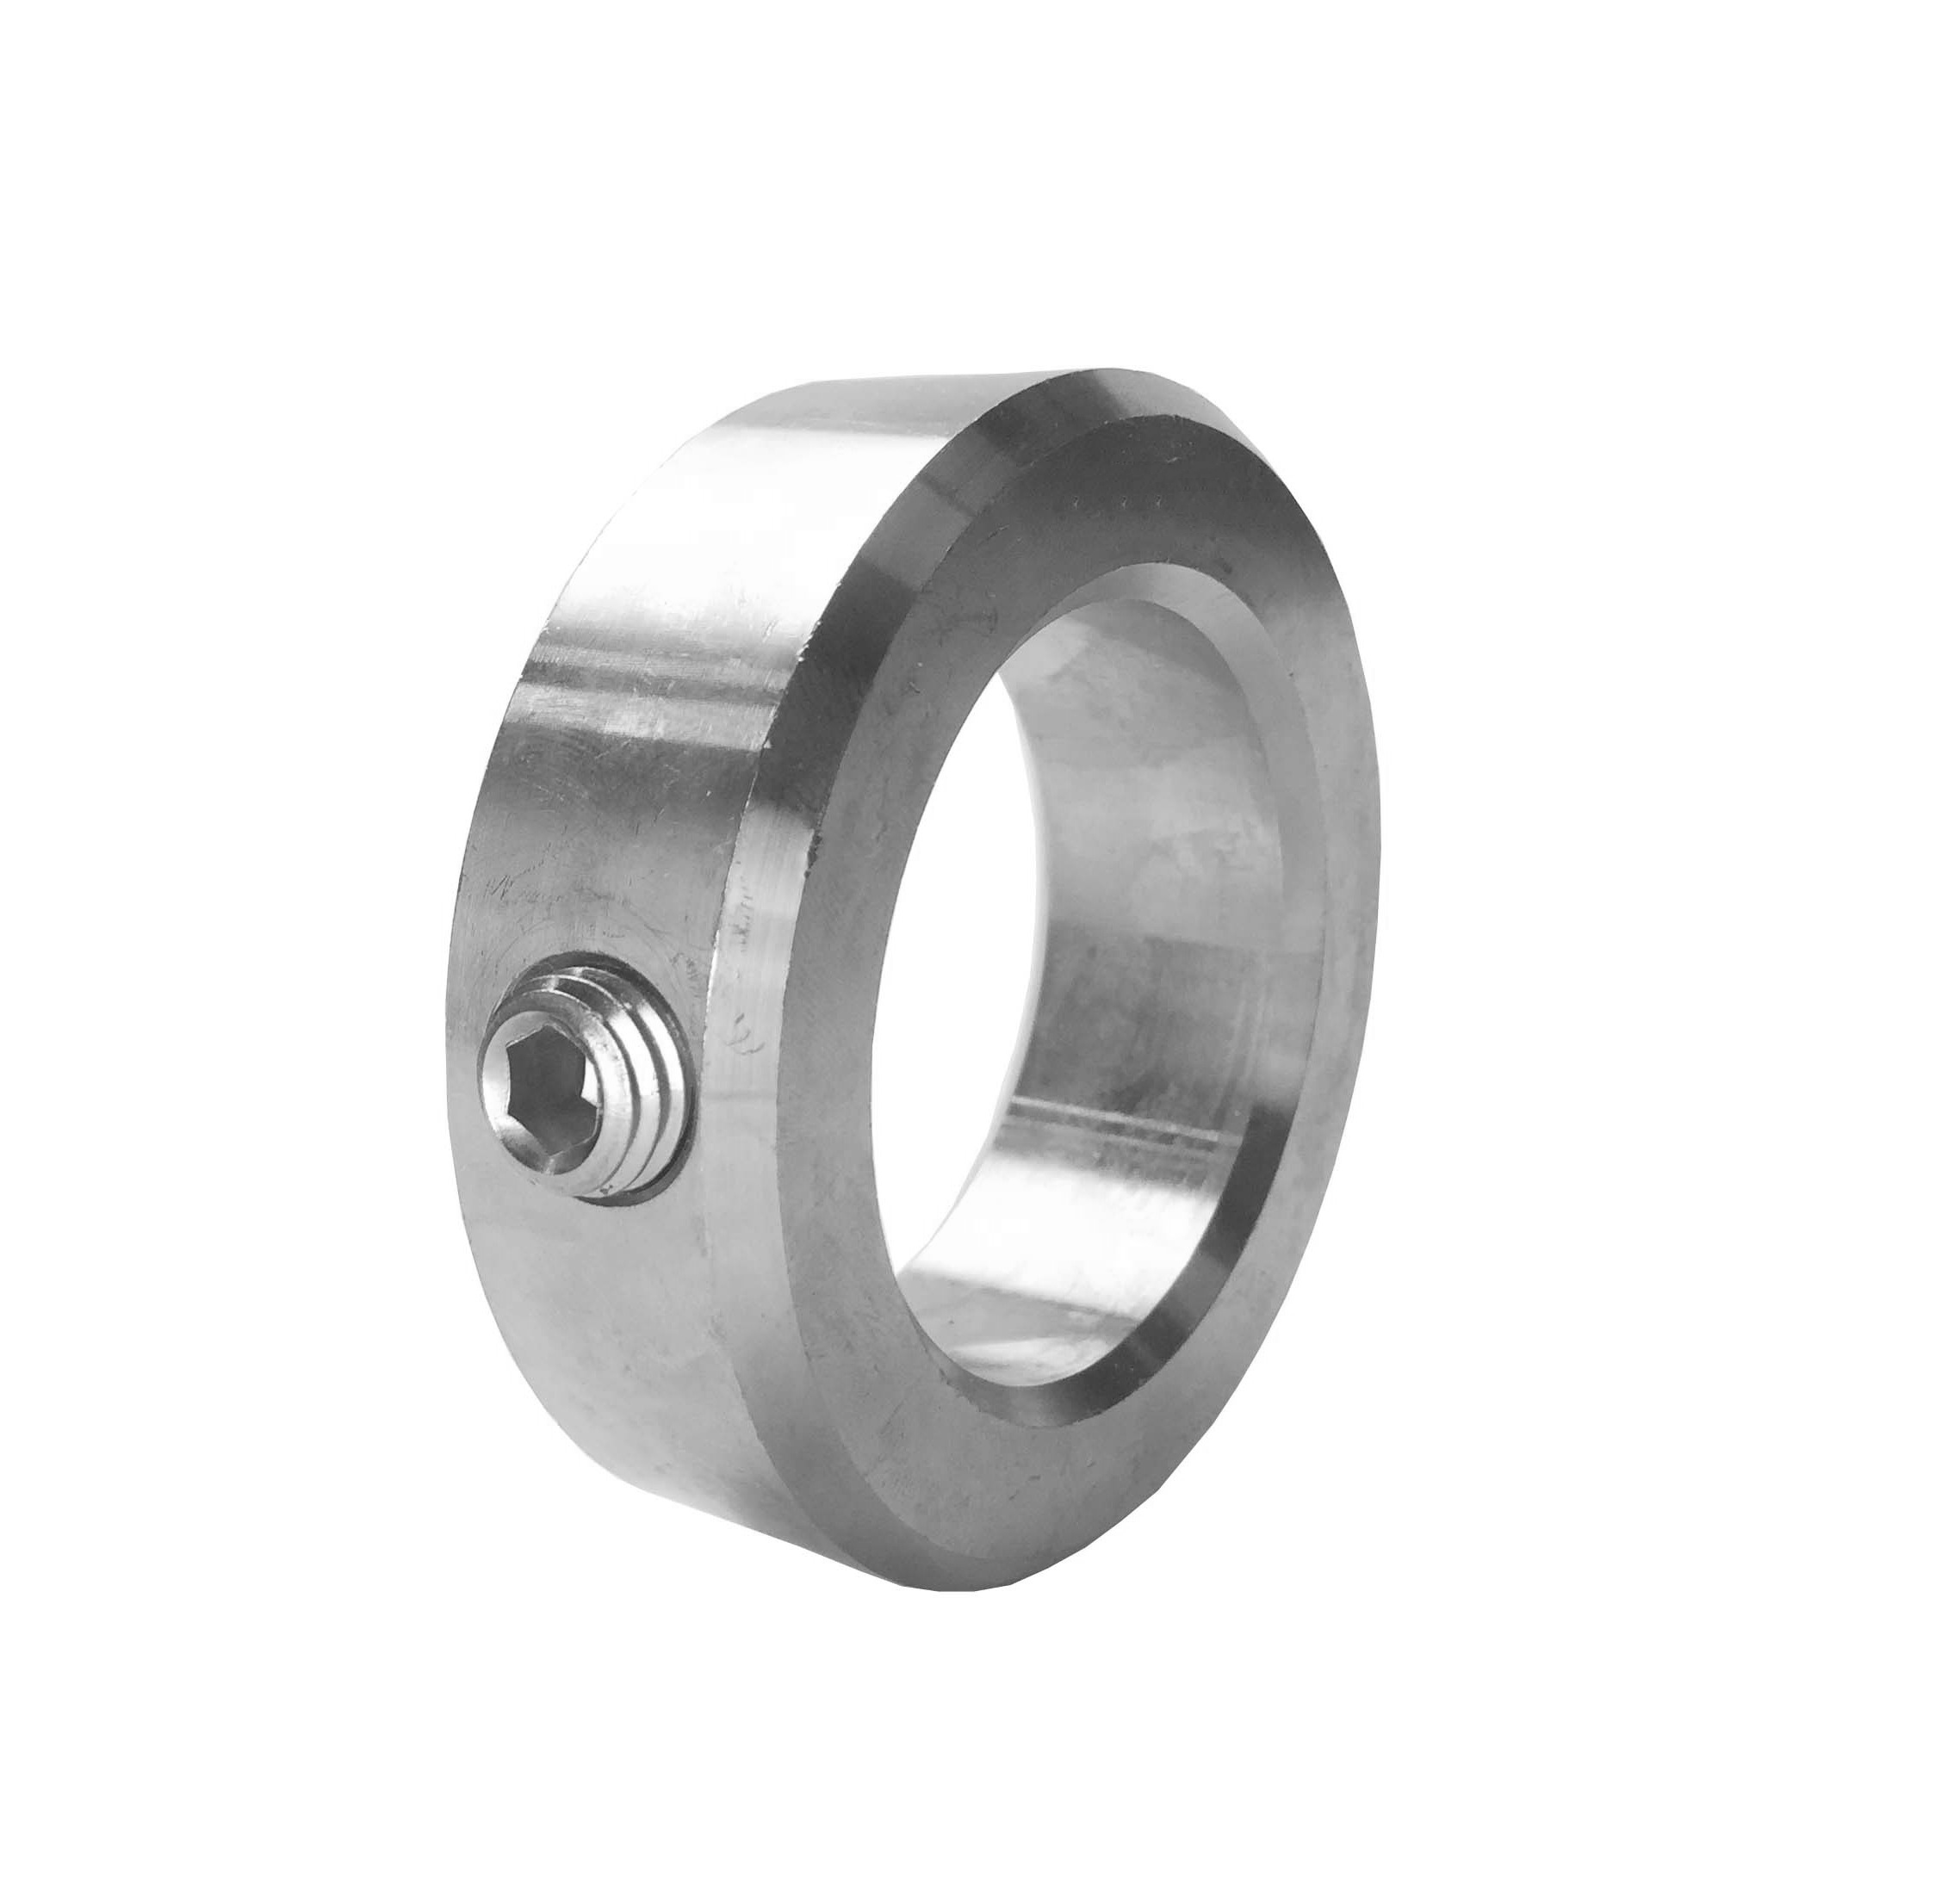 "3//8/"" shaft set screw solid steel collar stop zinc plated 3//8 inch collars"